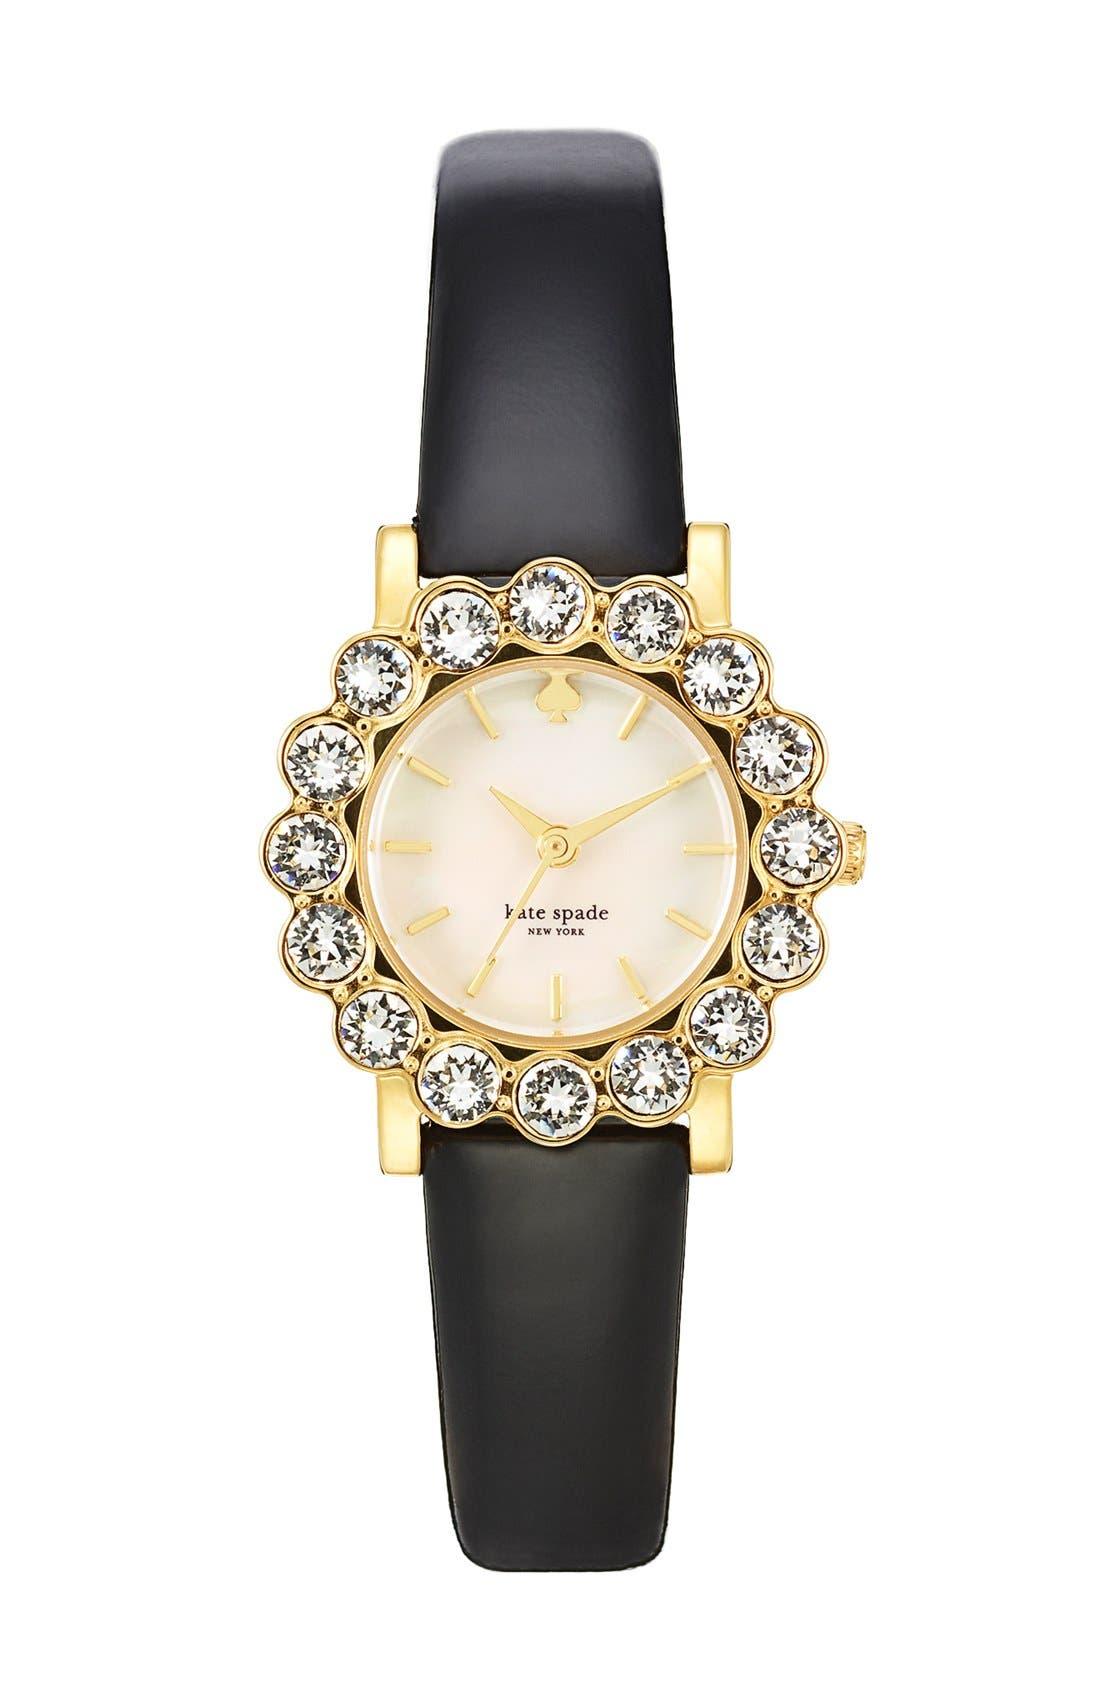 Main Image - kate spade new york 'belvedere' crystal bezel watch, 24mm